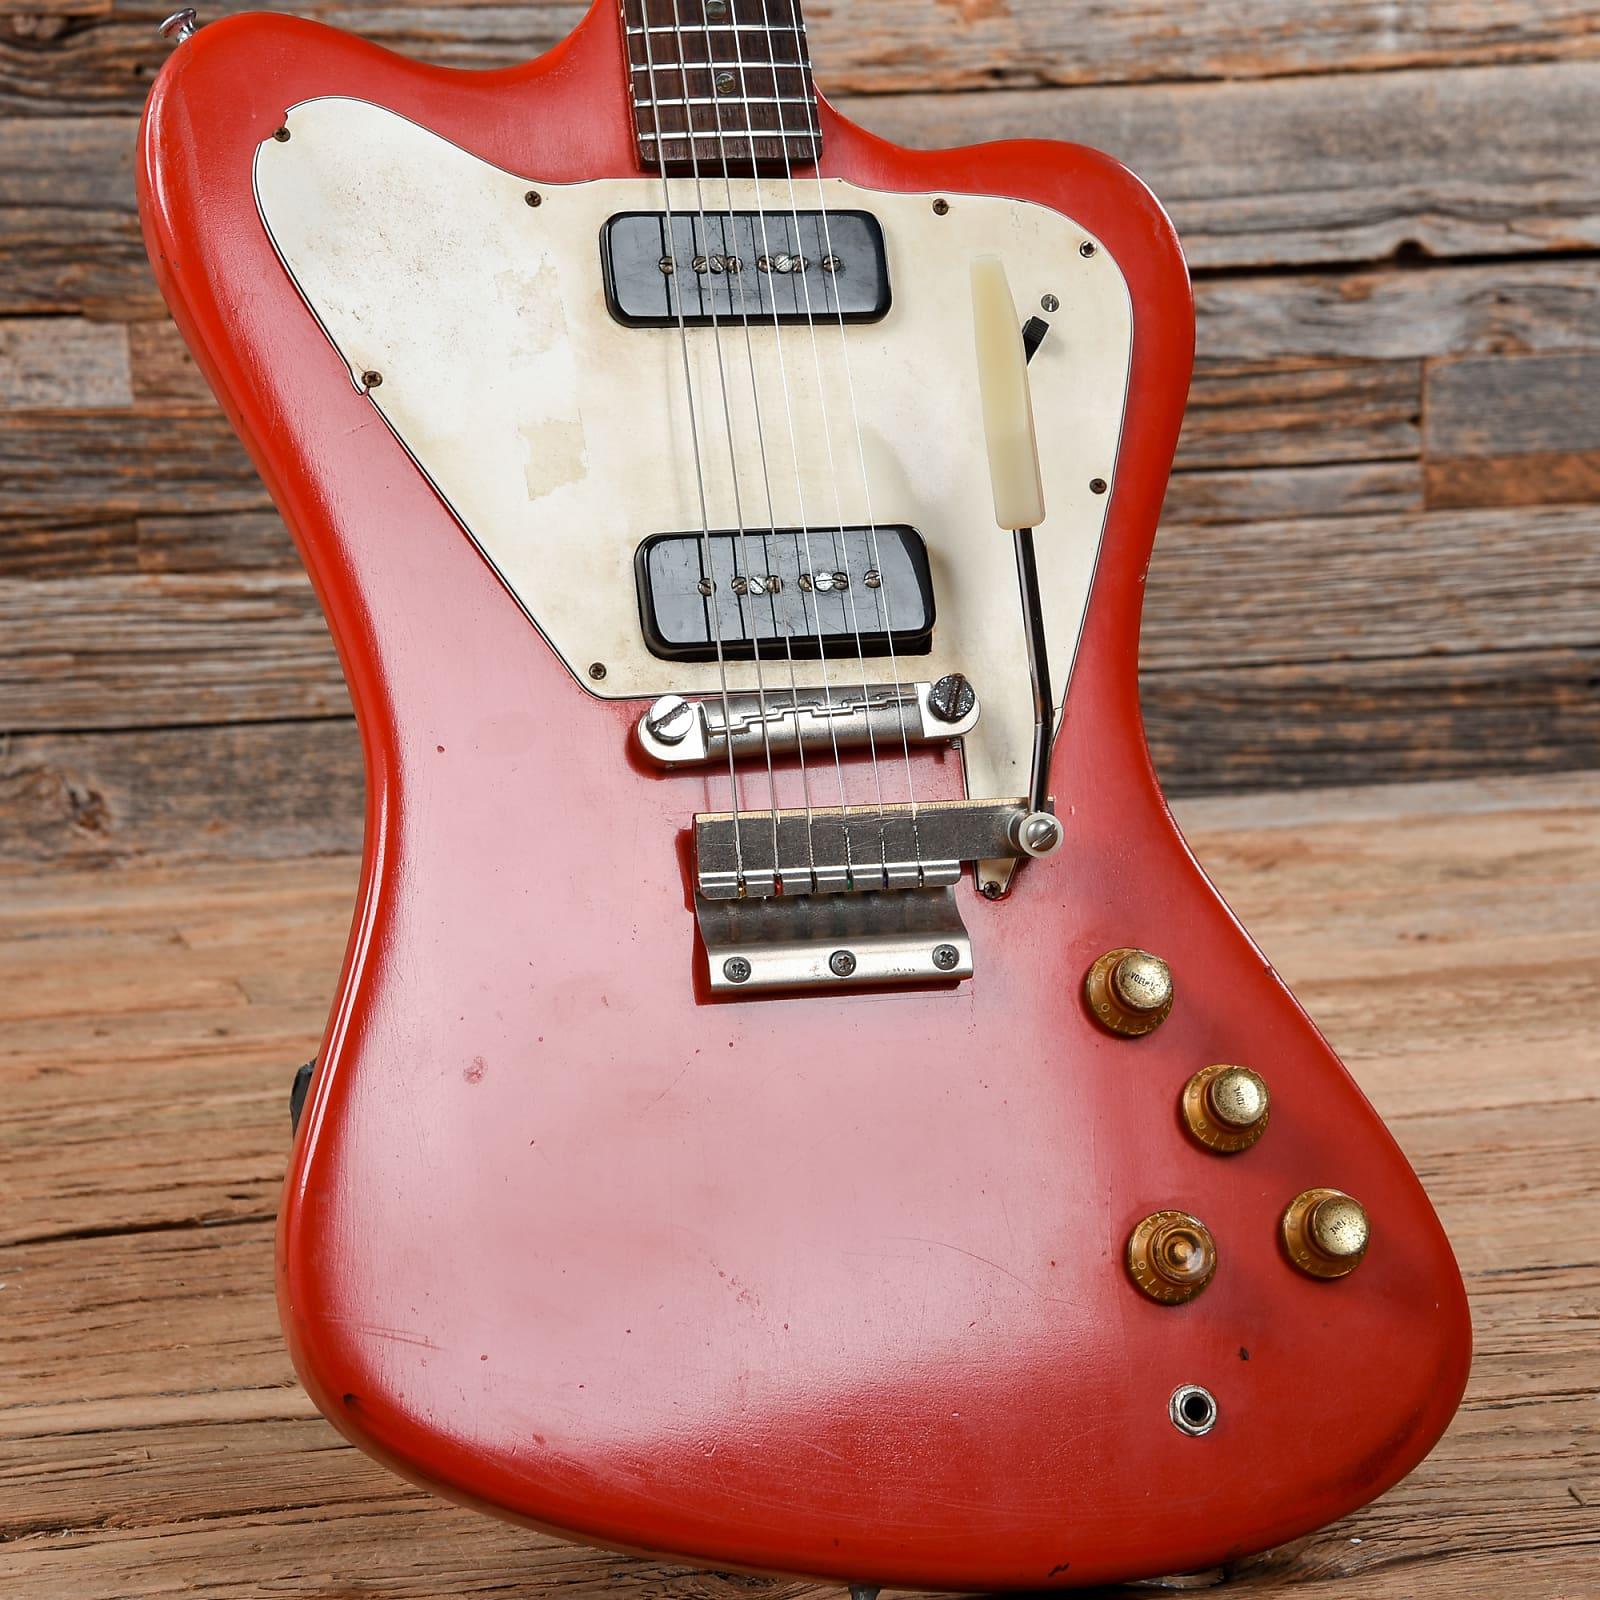 Stupendous Gibson Firebird I Cardinal Red Refin 1965 S791 Wiring Digital Resources Honesemecshebarightsorg